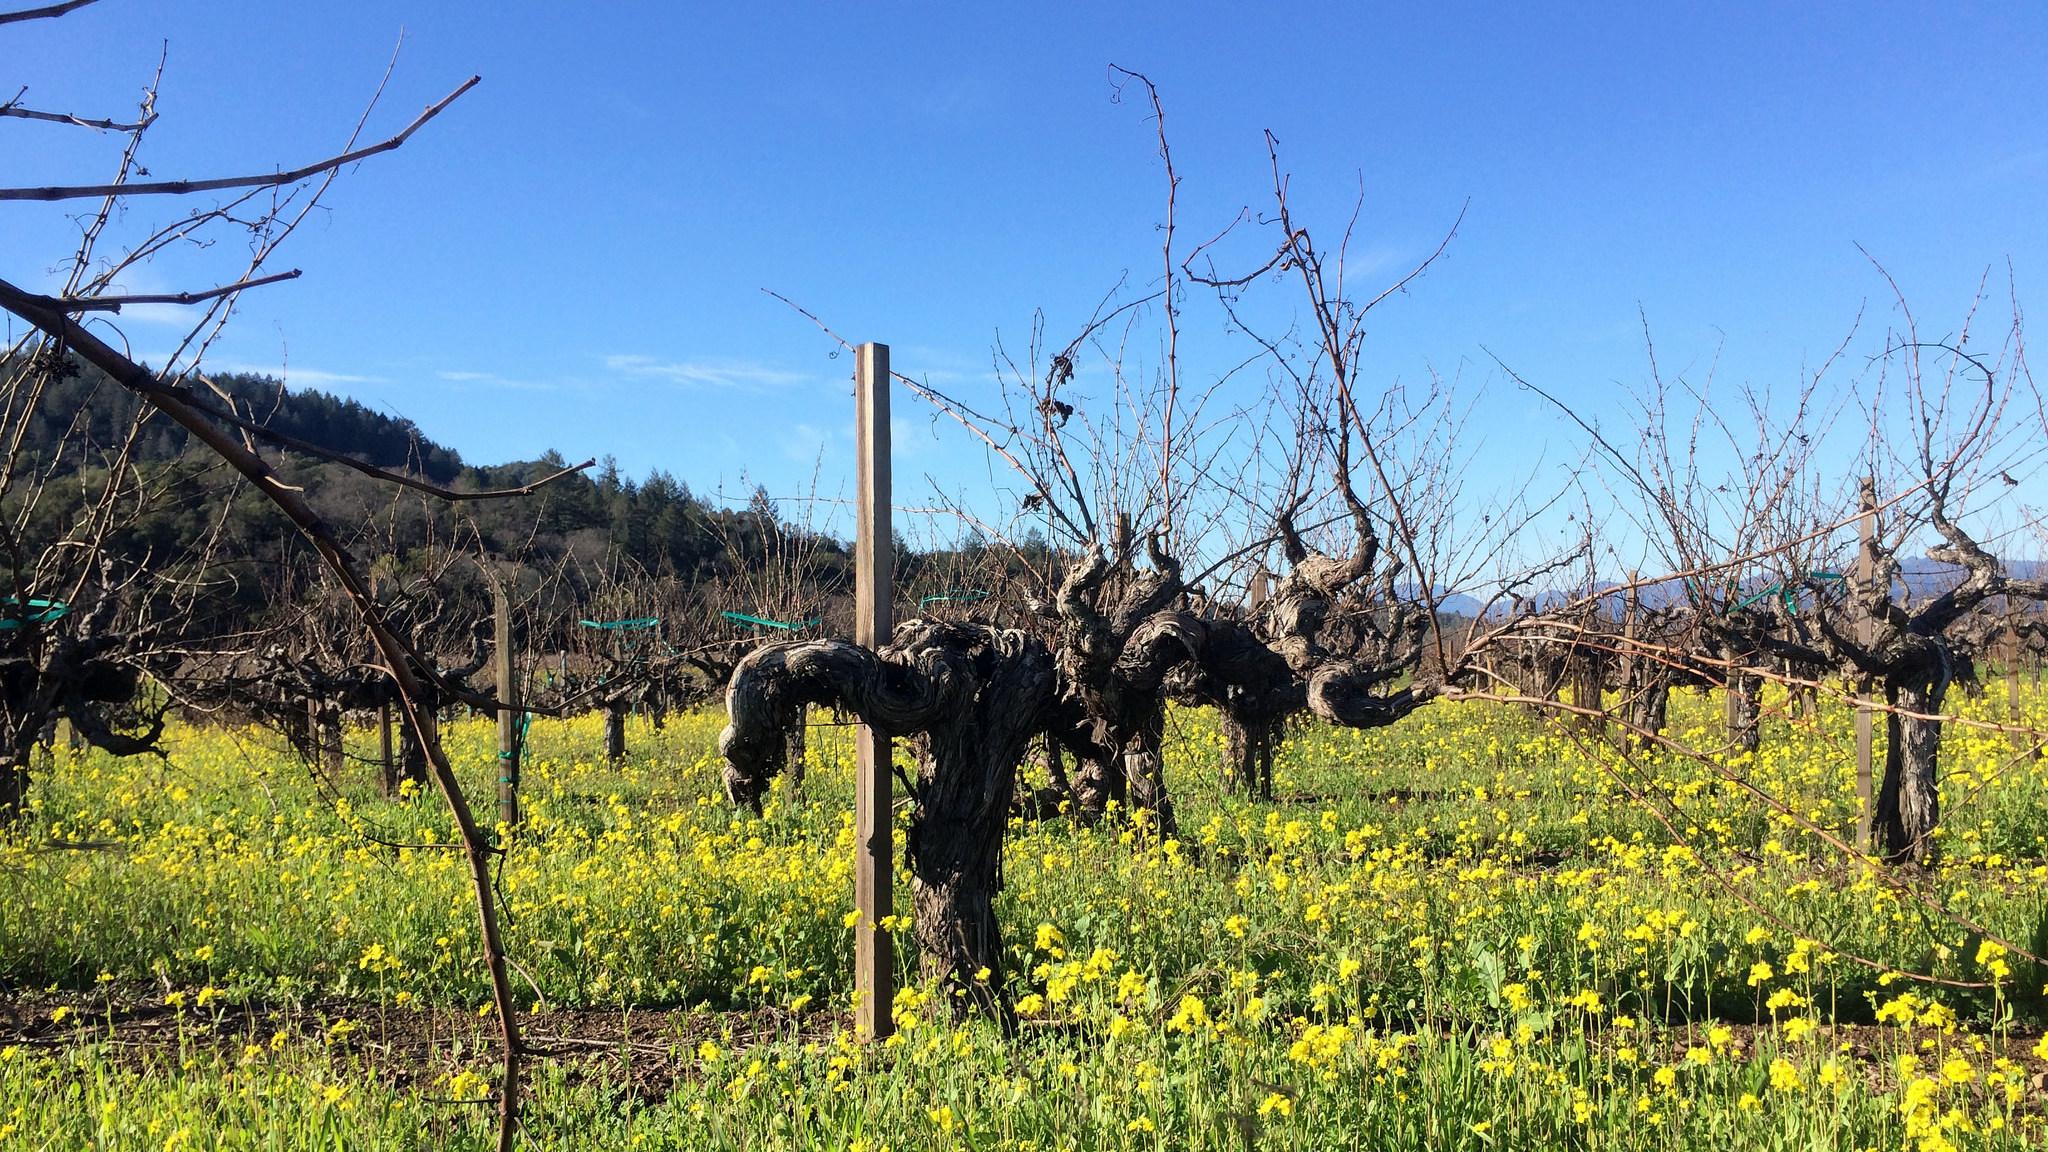 Napa Valley, To Kalon (iBlock) Weinberg der Robert Mondavi Winery, Blick Richtung Mayacamas Mountains